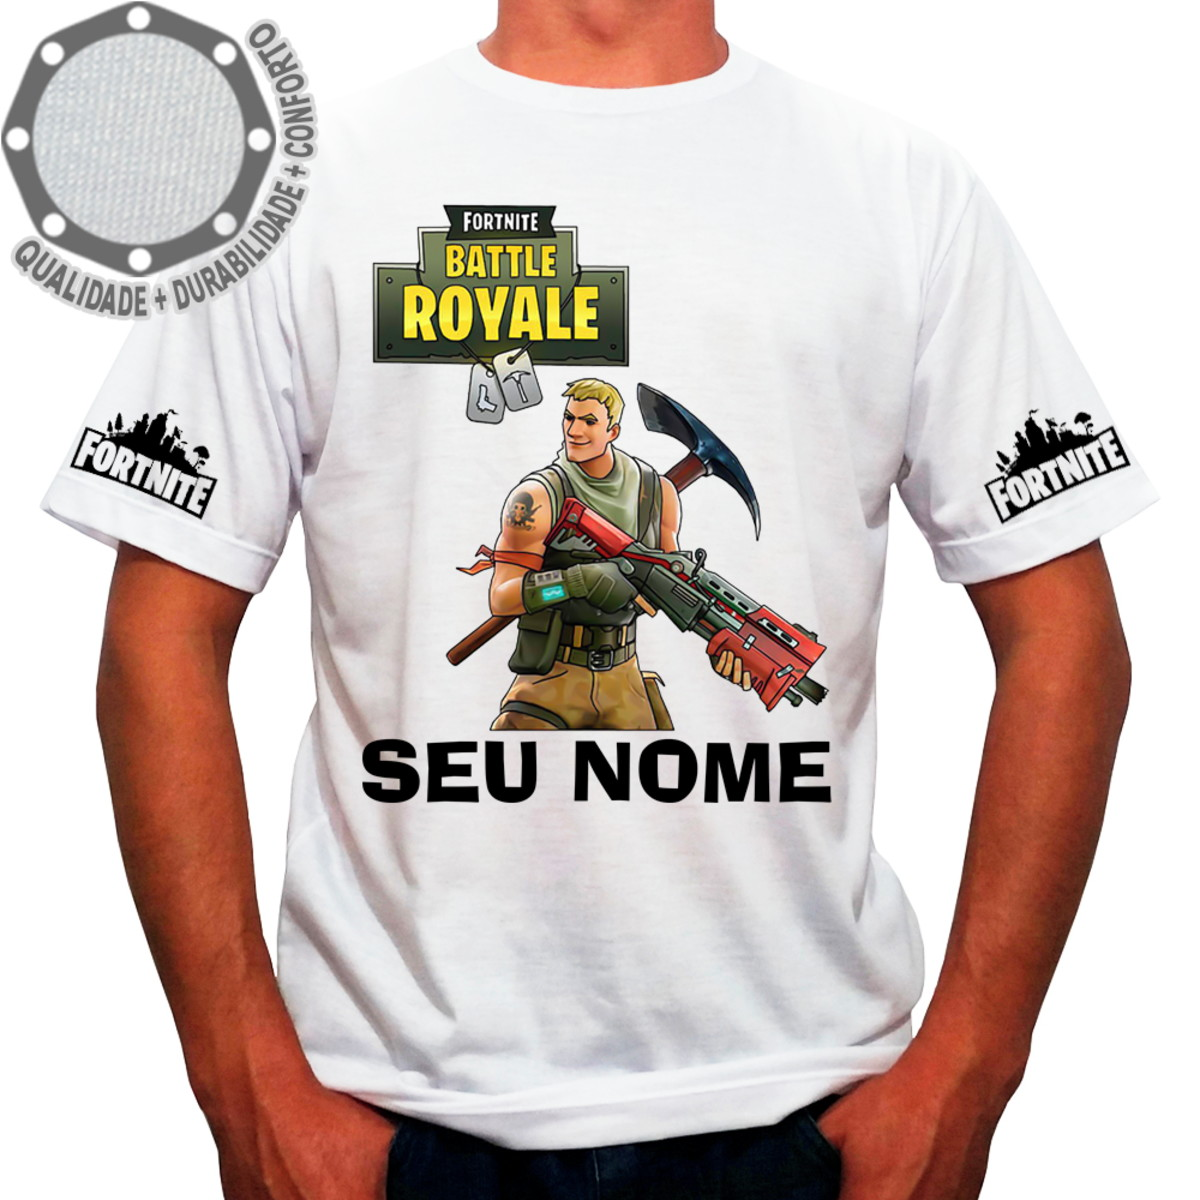 encontrar mano de obra Boutique en ligne diseñador de moda Camiseta Fortnite Boy